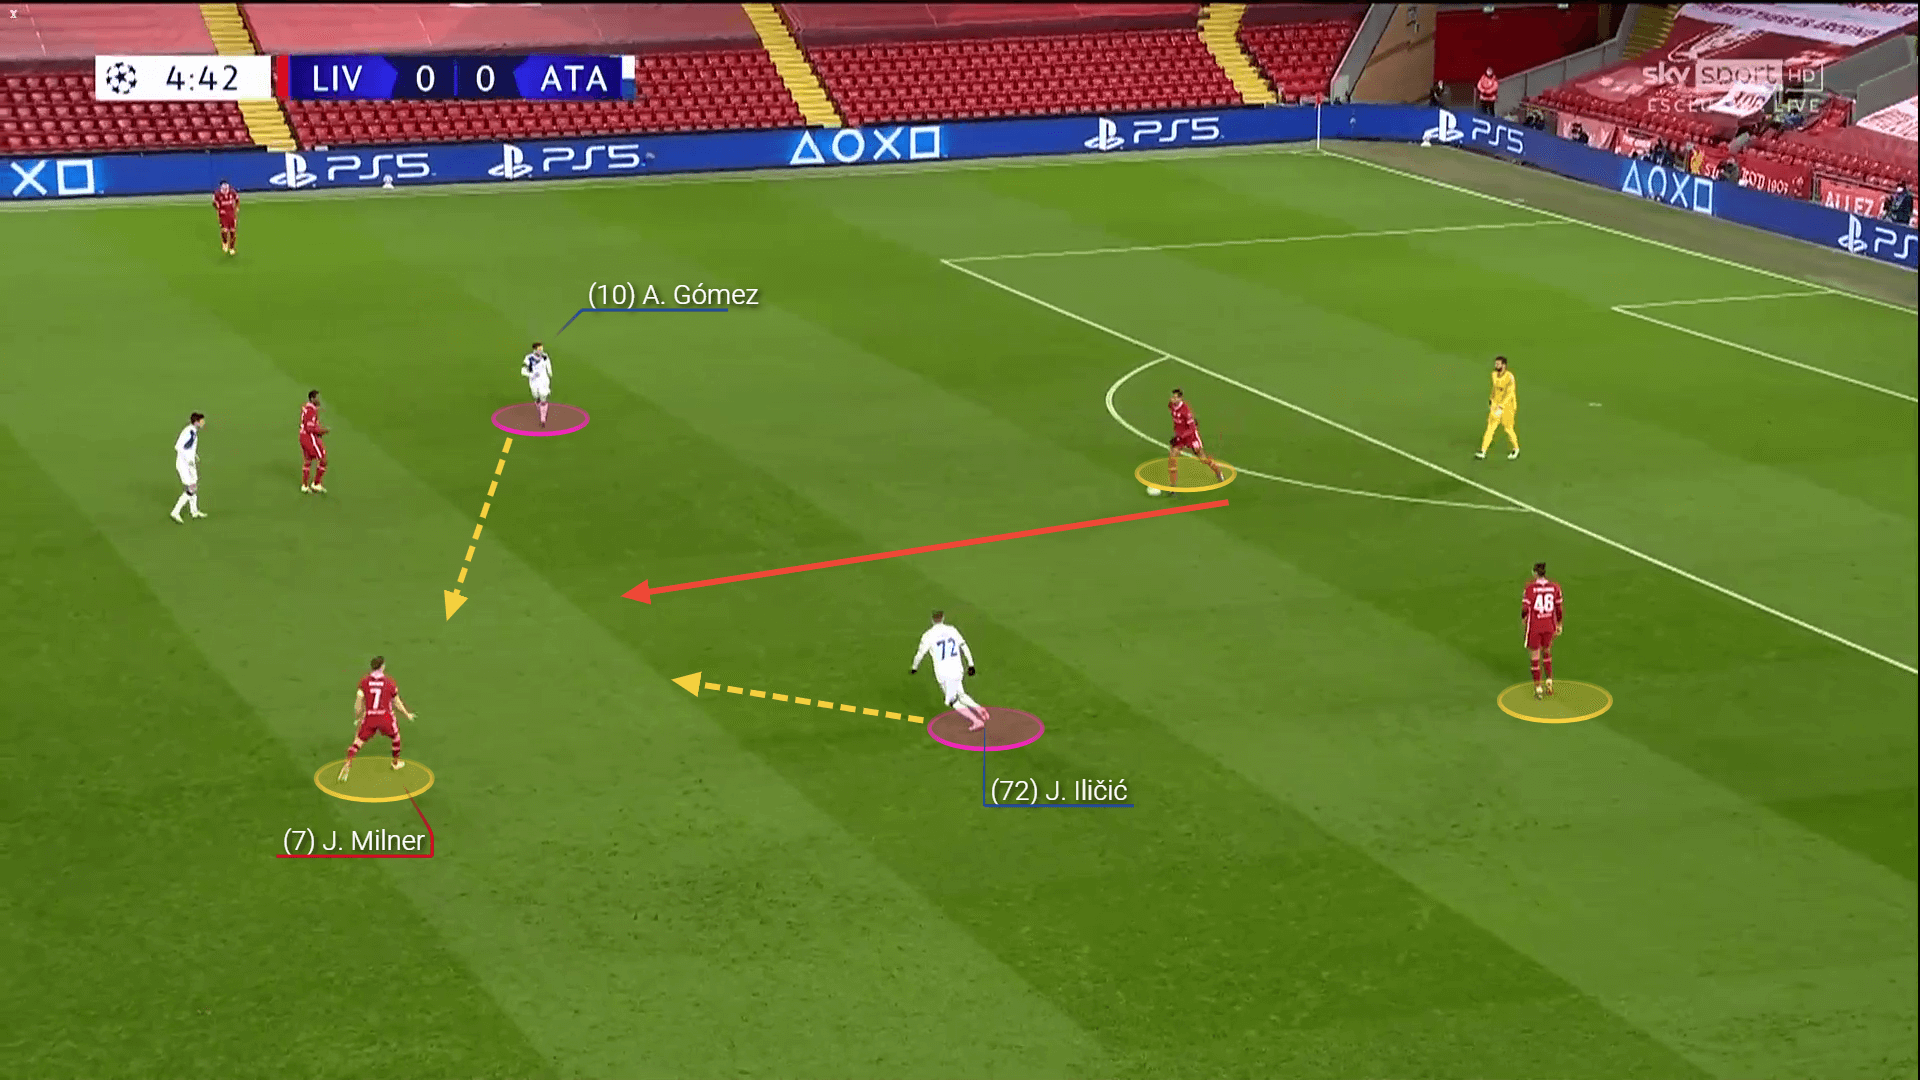 UEFA Champions League 2020/21: How Atalanta's smart tactical choices disarmed Liverpool - tactical analysis tacticsUEFA Champions League 2020/21: How Atalanta's smart tactical choices disarmed Liverpool - tactical analysis tactics